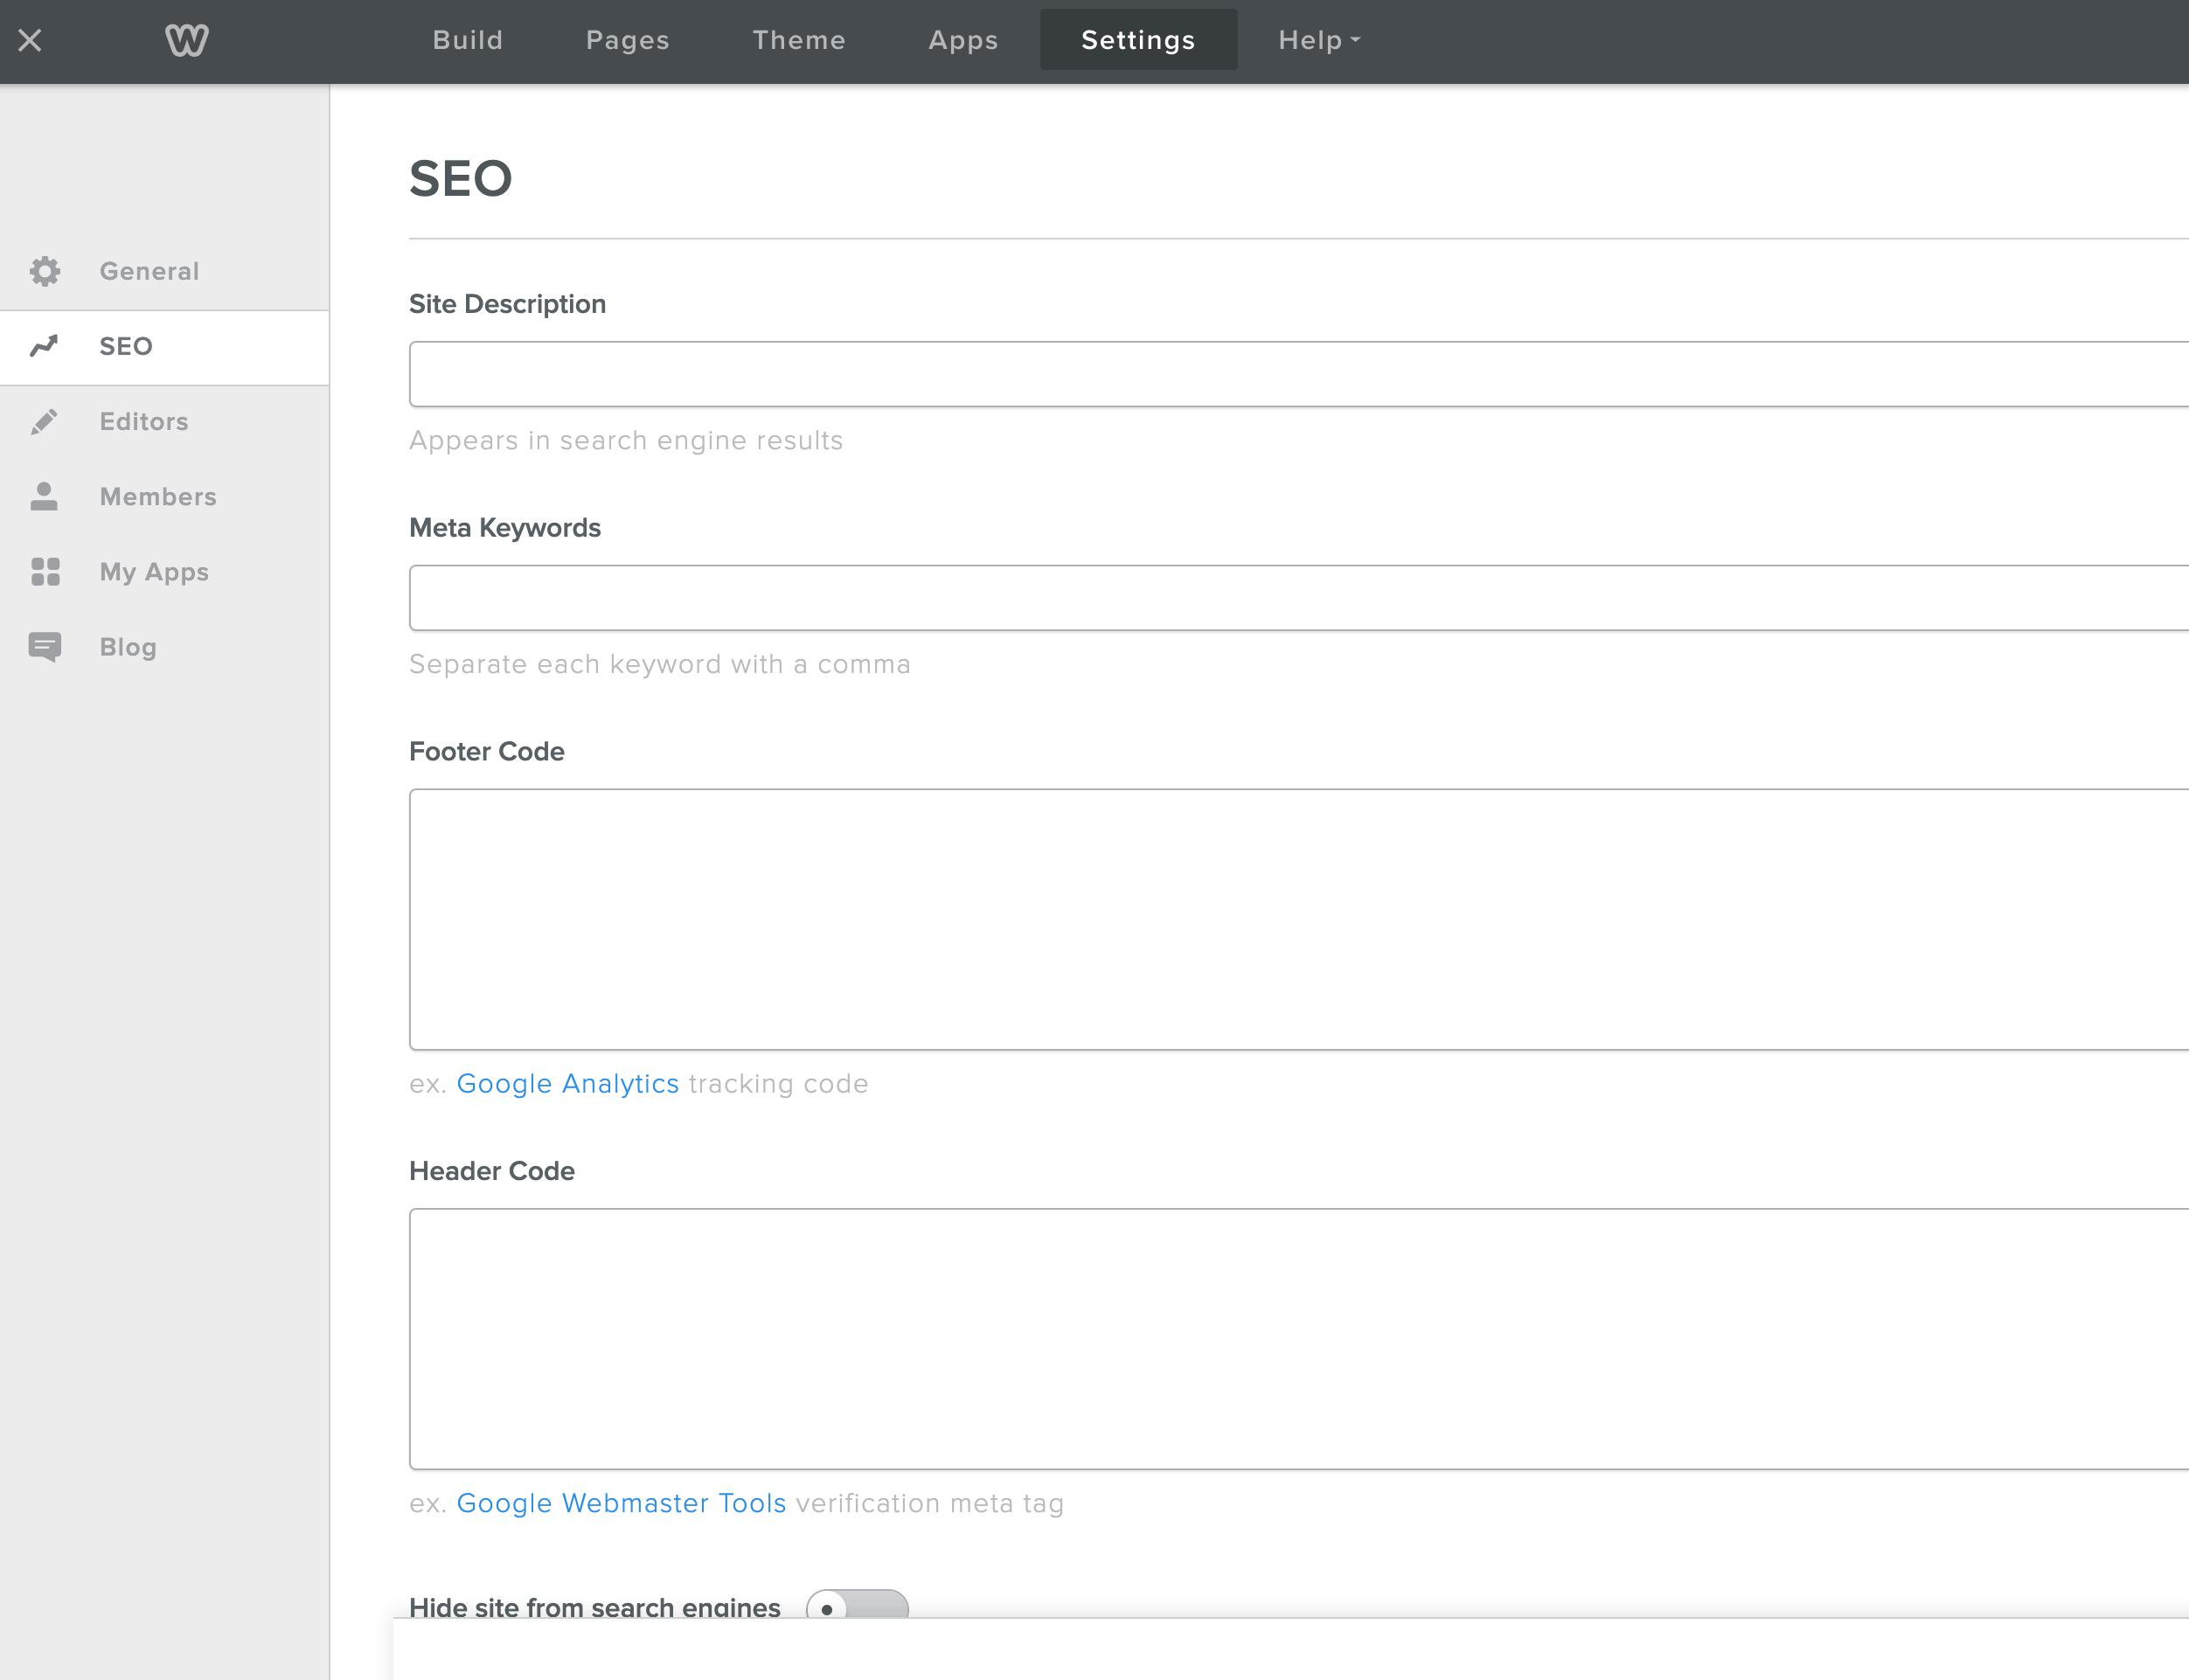 Configuration de site Weebly: Options SEO